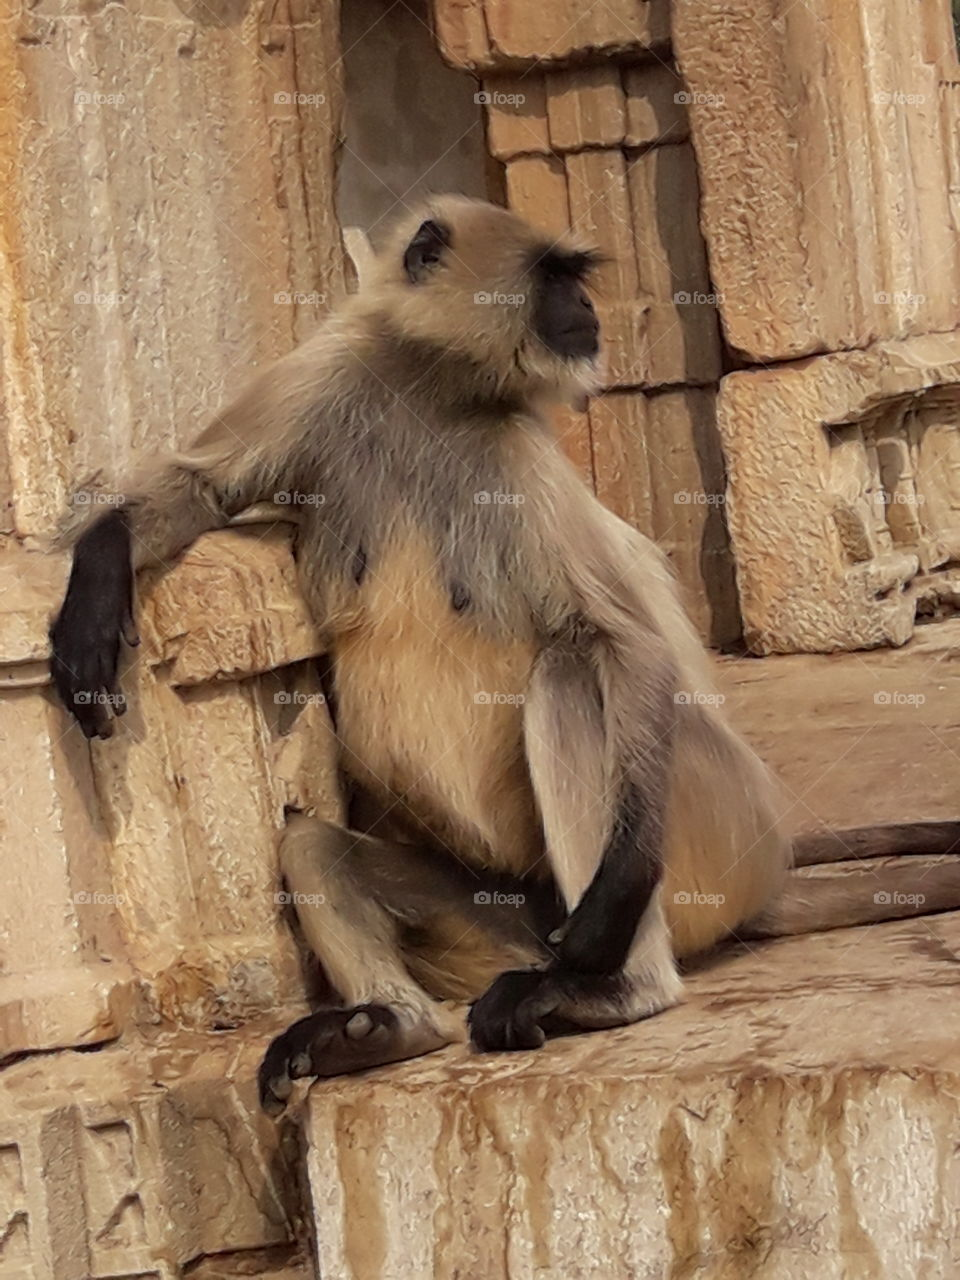 wildlife#naturelover#forfather#human#cute monkey